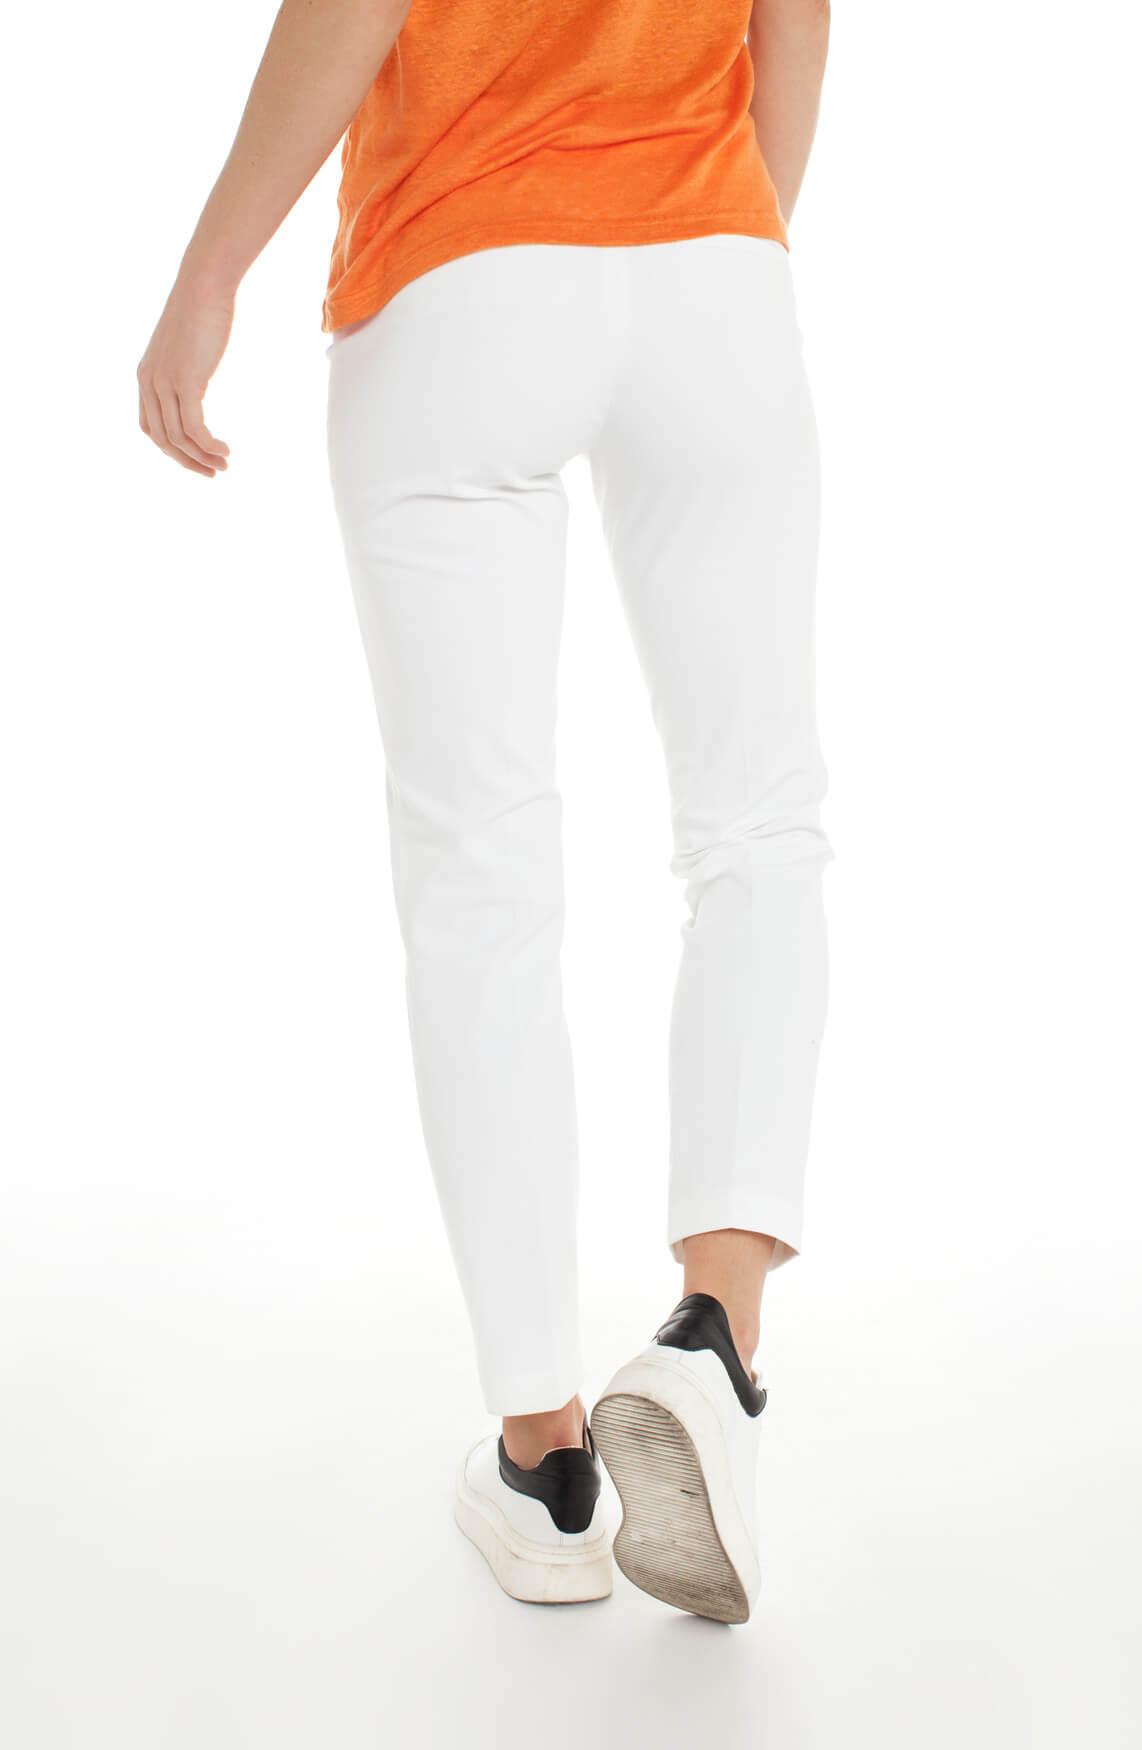 Cambio Dames Ros pantalon met gestikte plooien wit